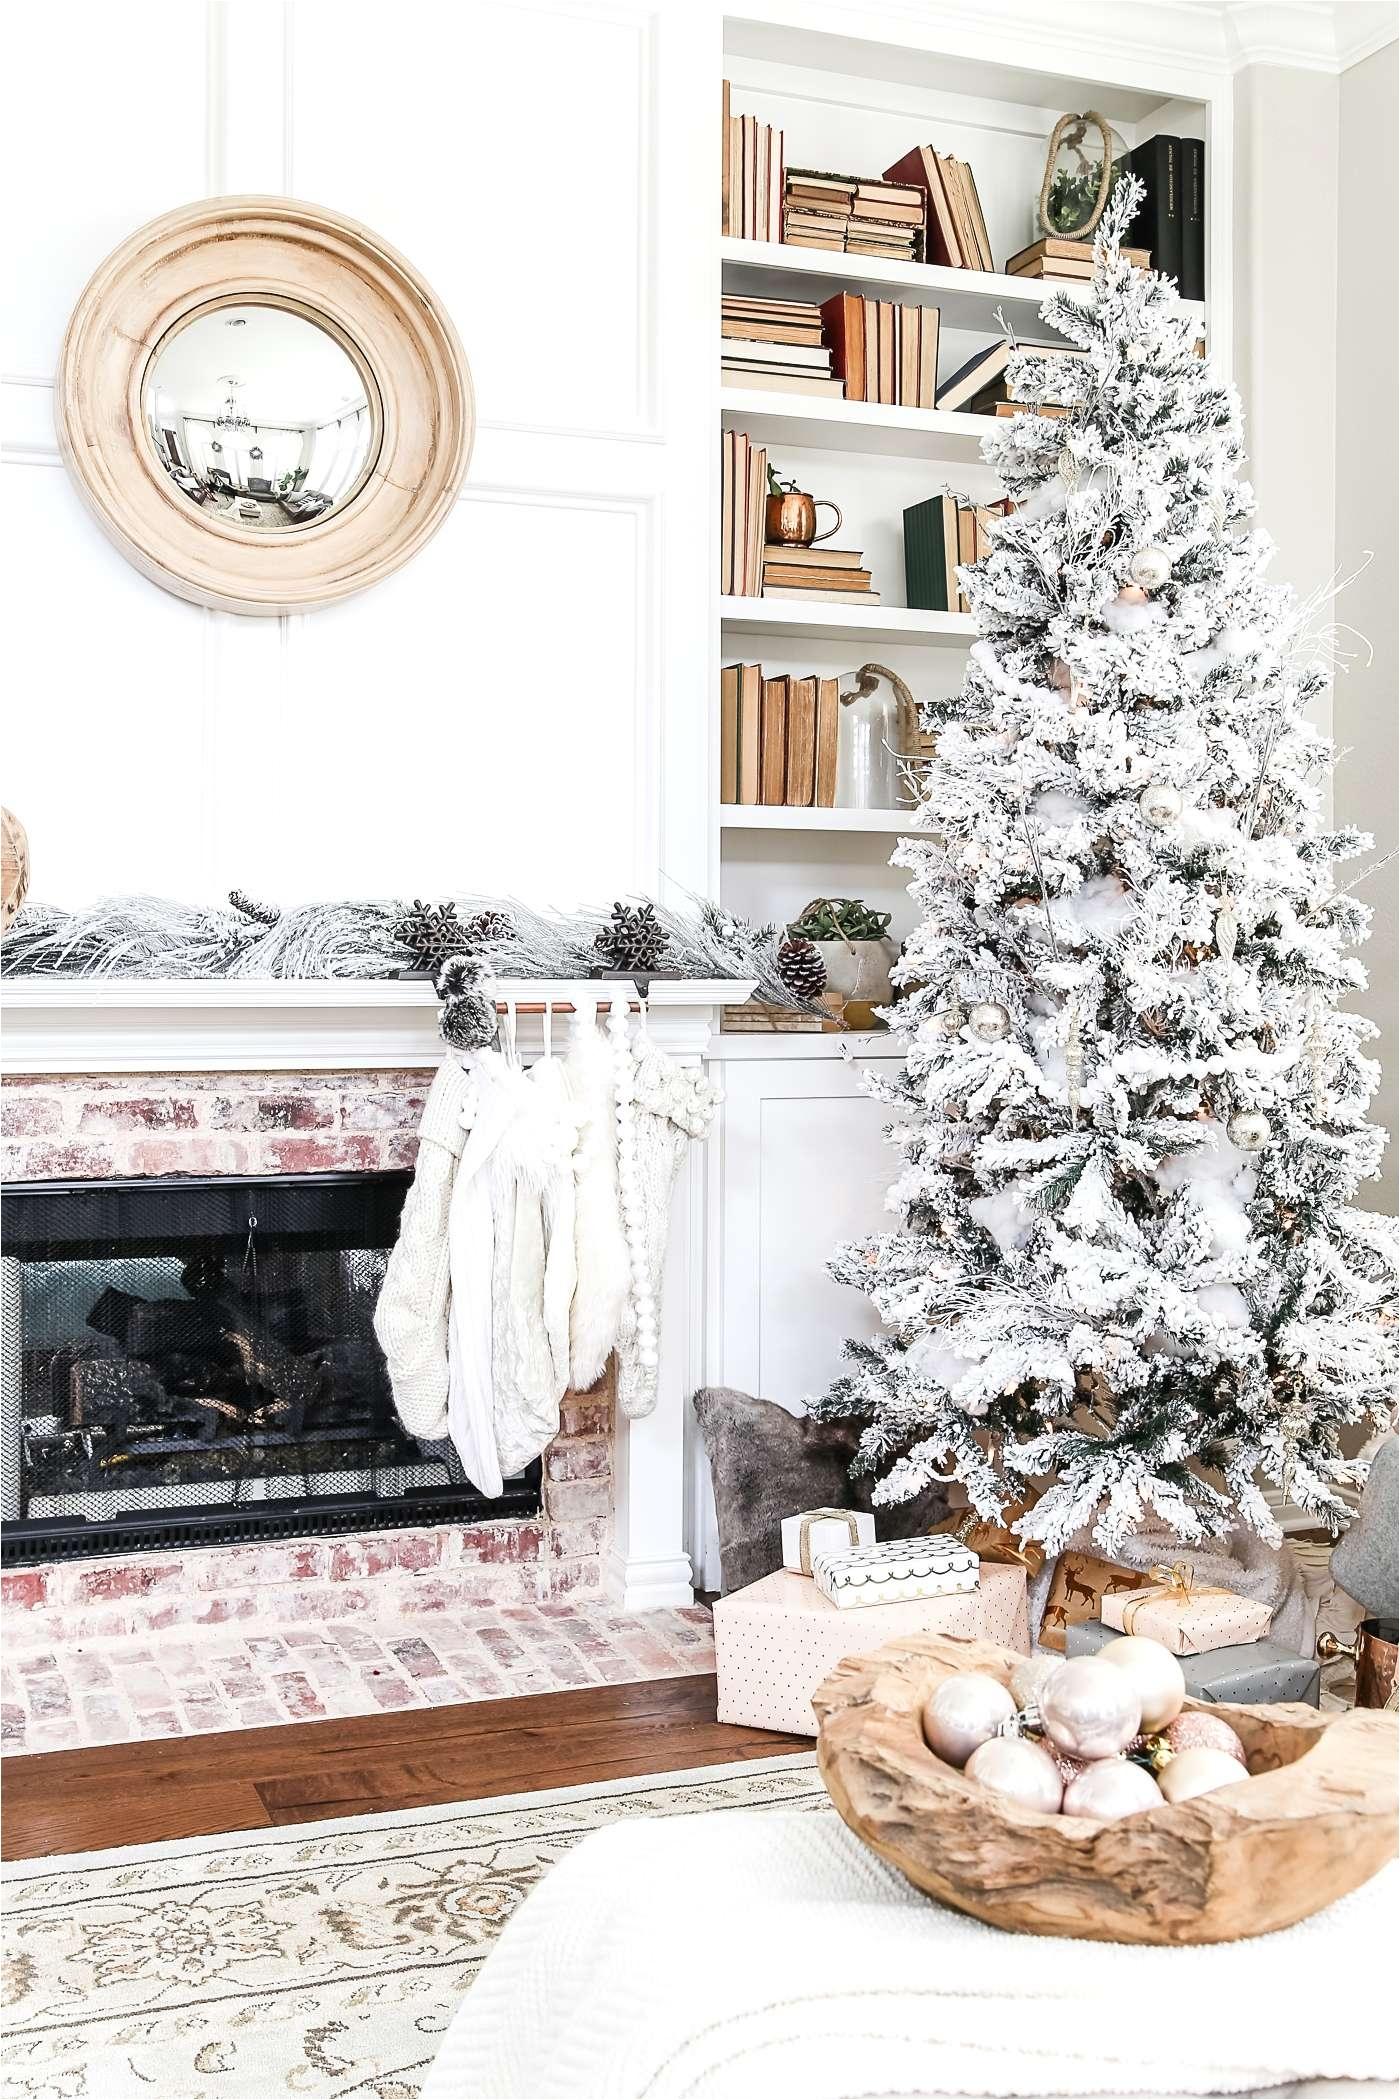 graceful holiday home decor within home decor mail order catalog best decor iron decor iron decor